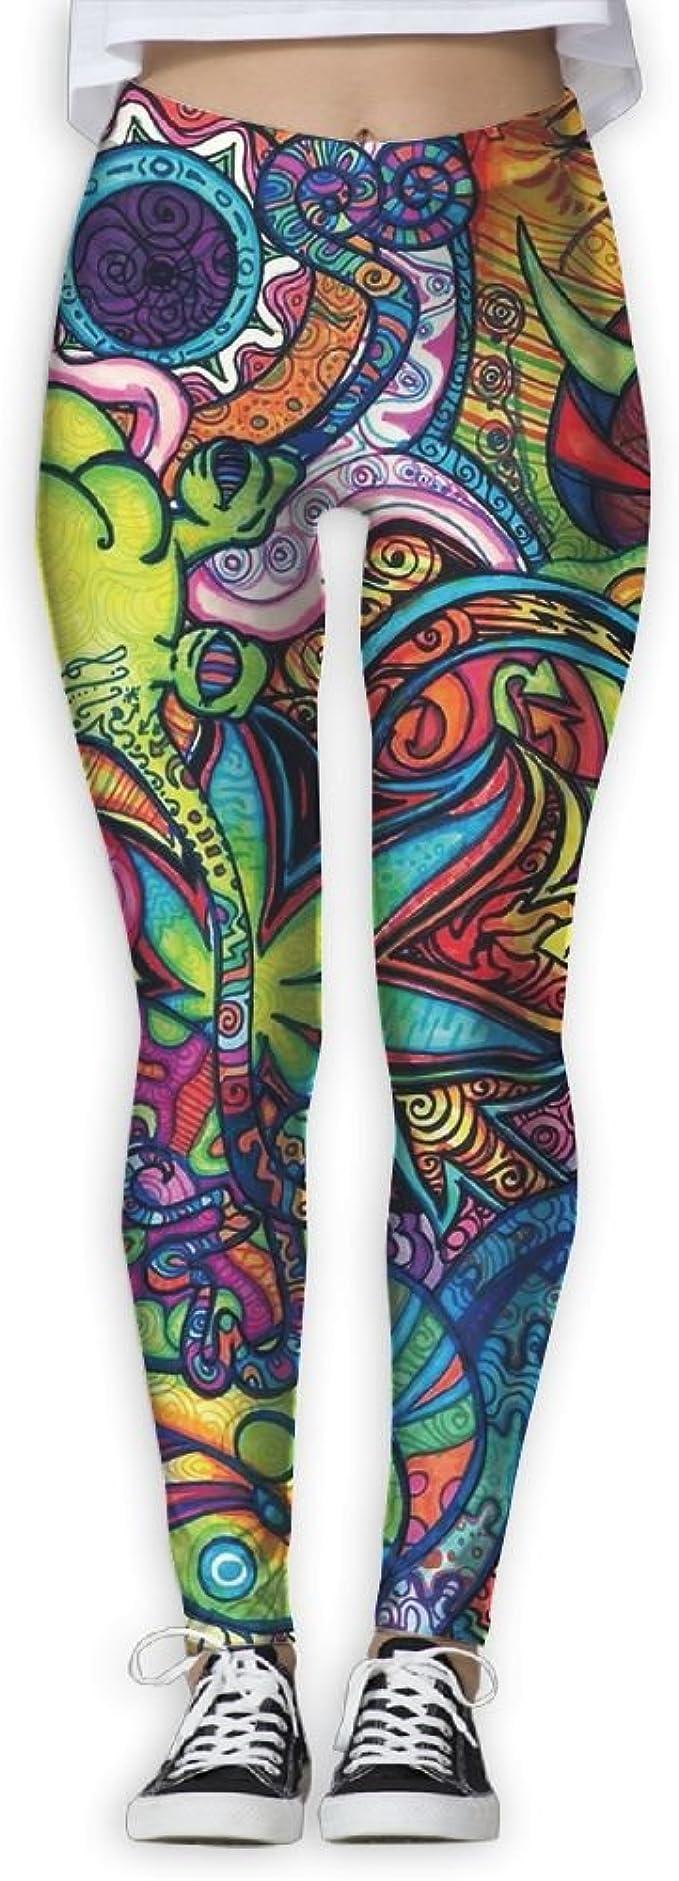 Lava Lamp Plus Size Leggings Rainbow Leggings Yoga Leggings Yoga Pants Women Tights Psychedelic Clothing Hippie Clothes Trippy Woodstock